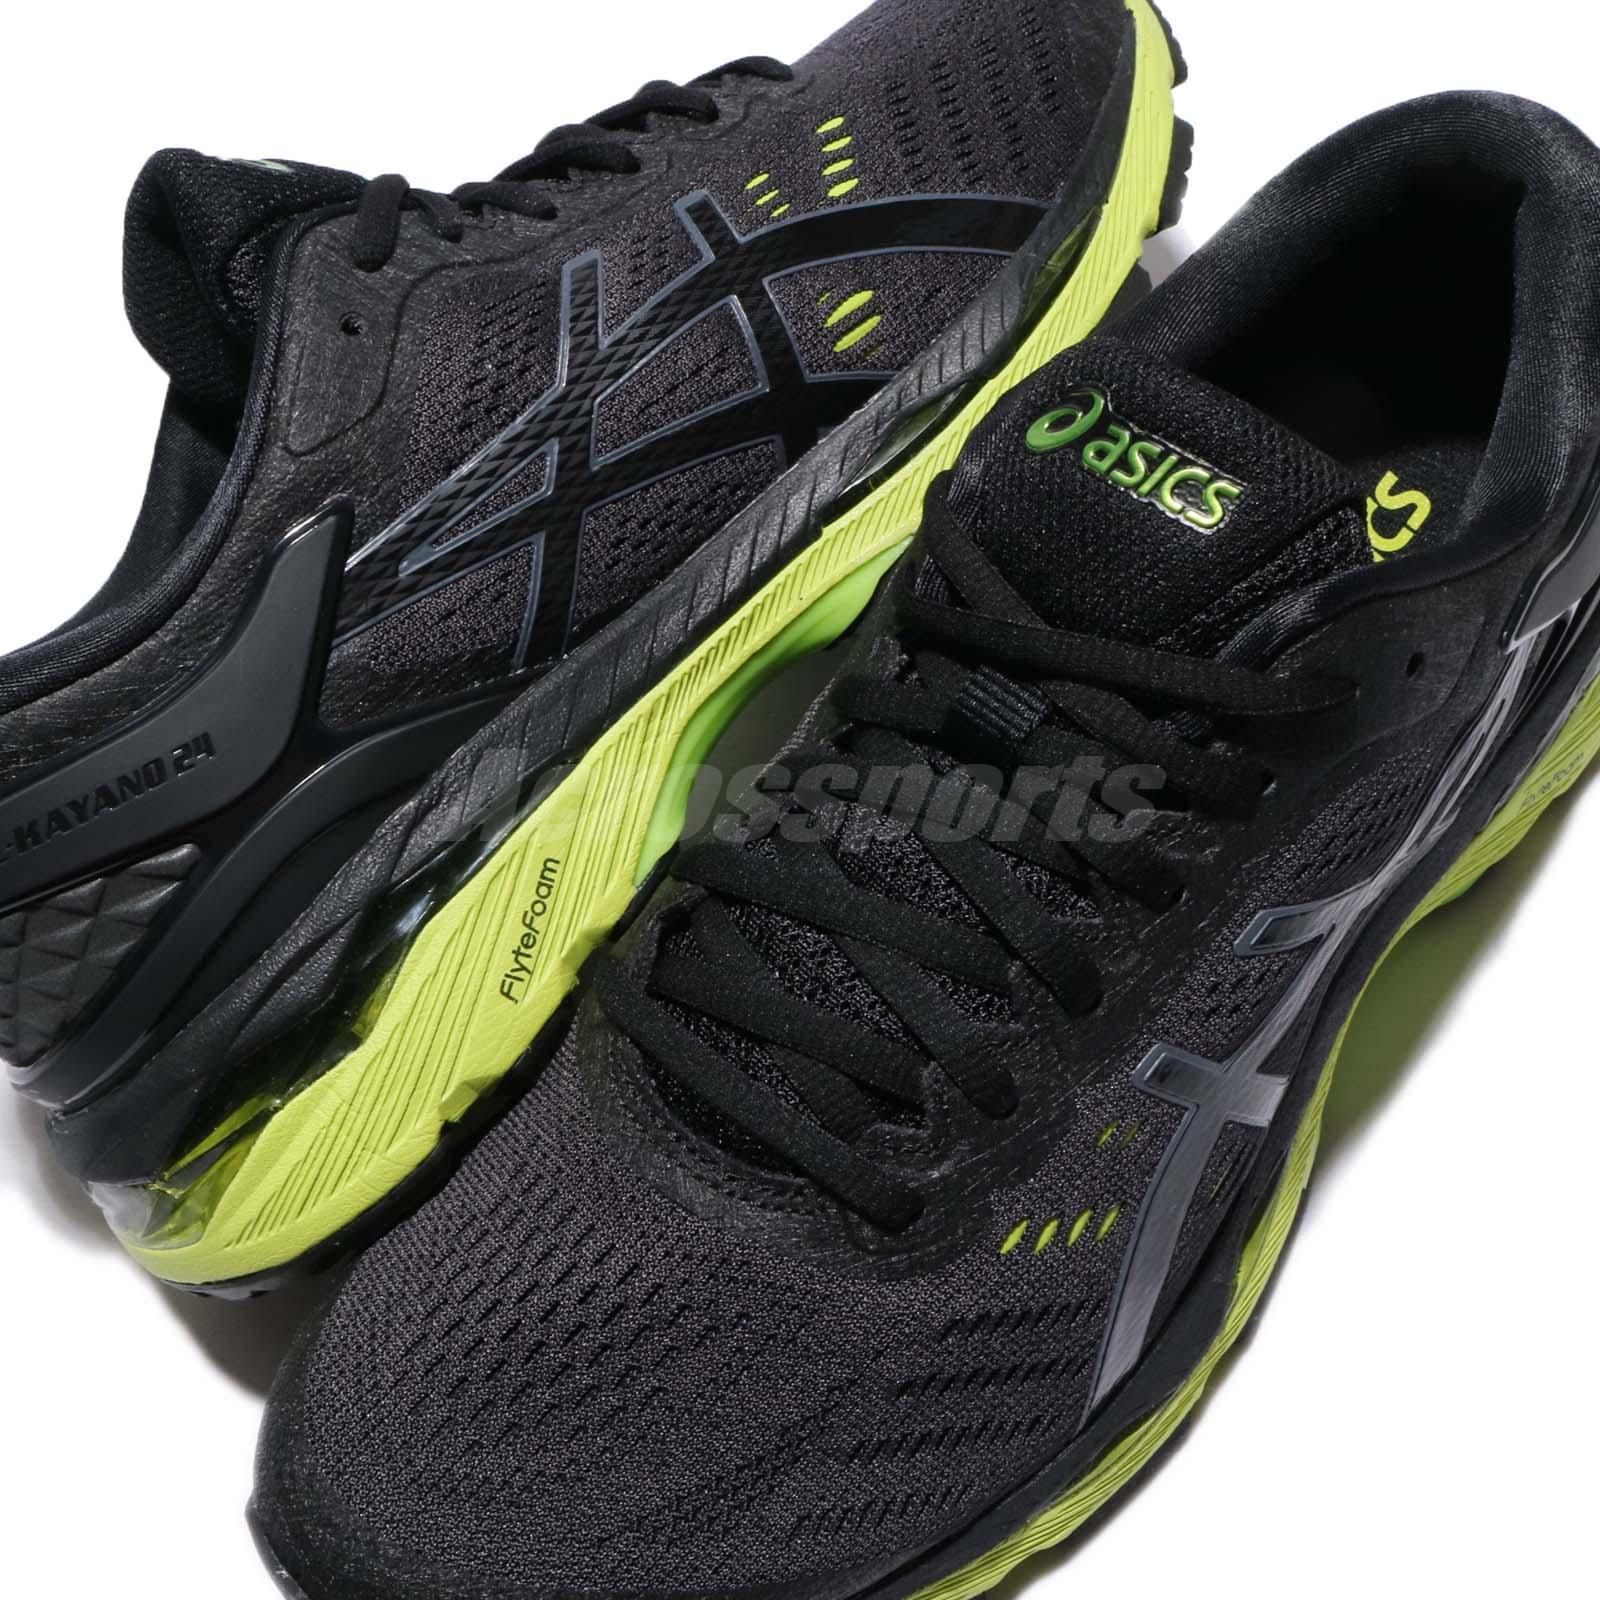 a6262877d8ec Asics Gel-Kayano 24 Black Green Phantom Men Running Shoes Sneakers ...